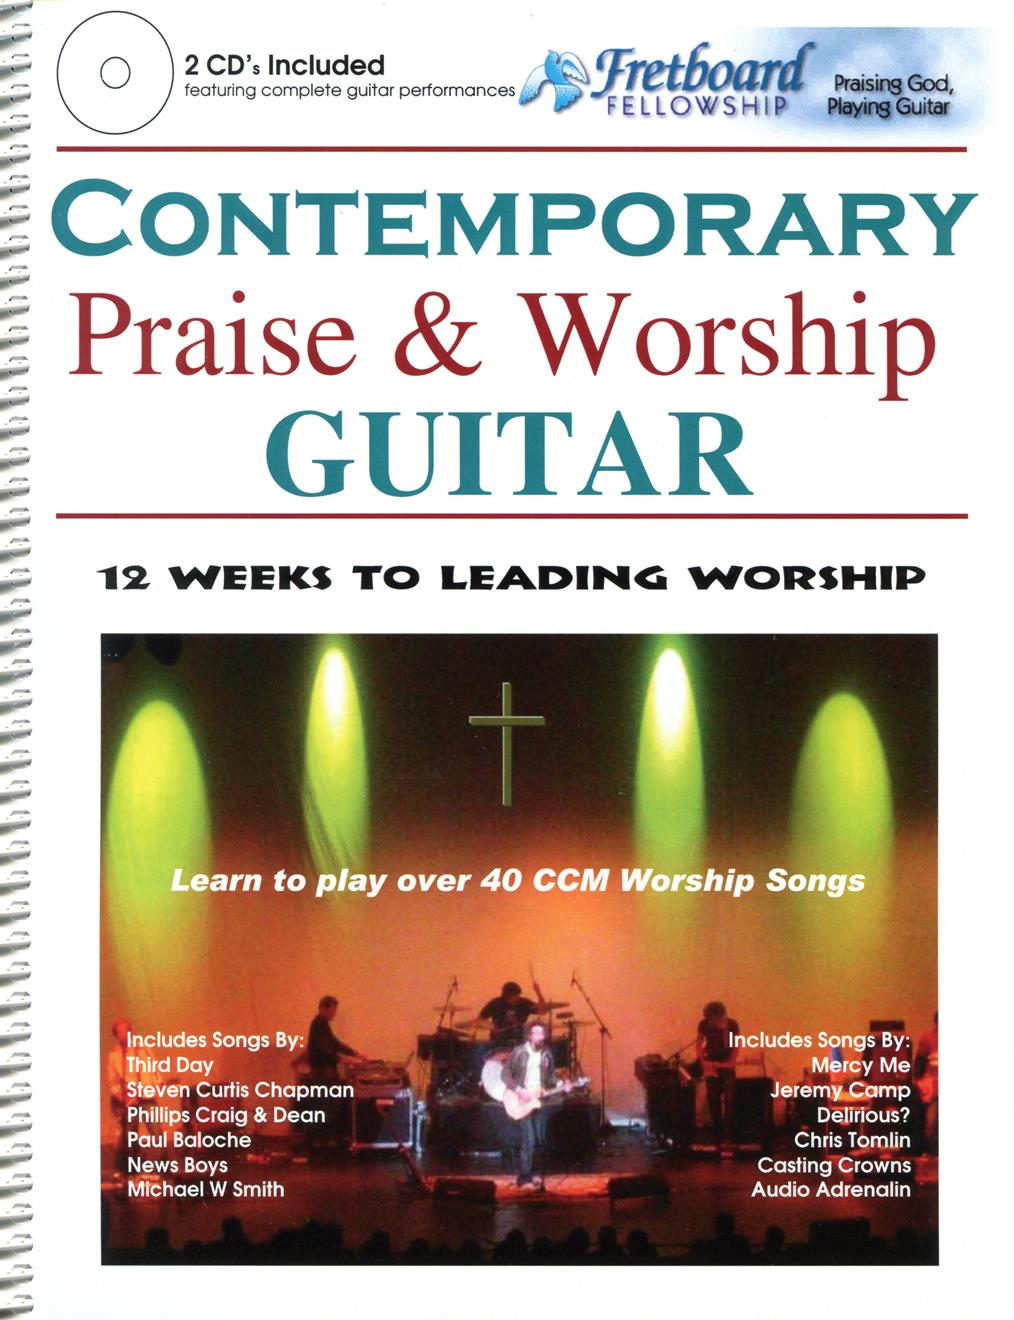 CONTEMPORARY PRAISE & WORSHIP GUITAR - Cover Image